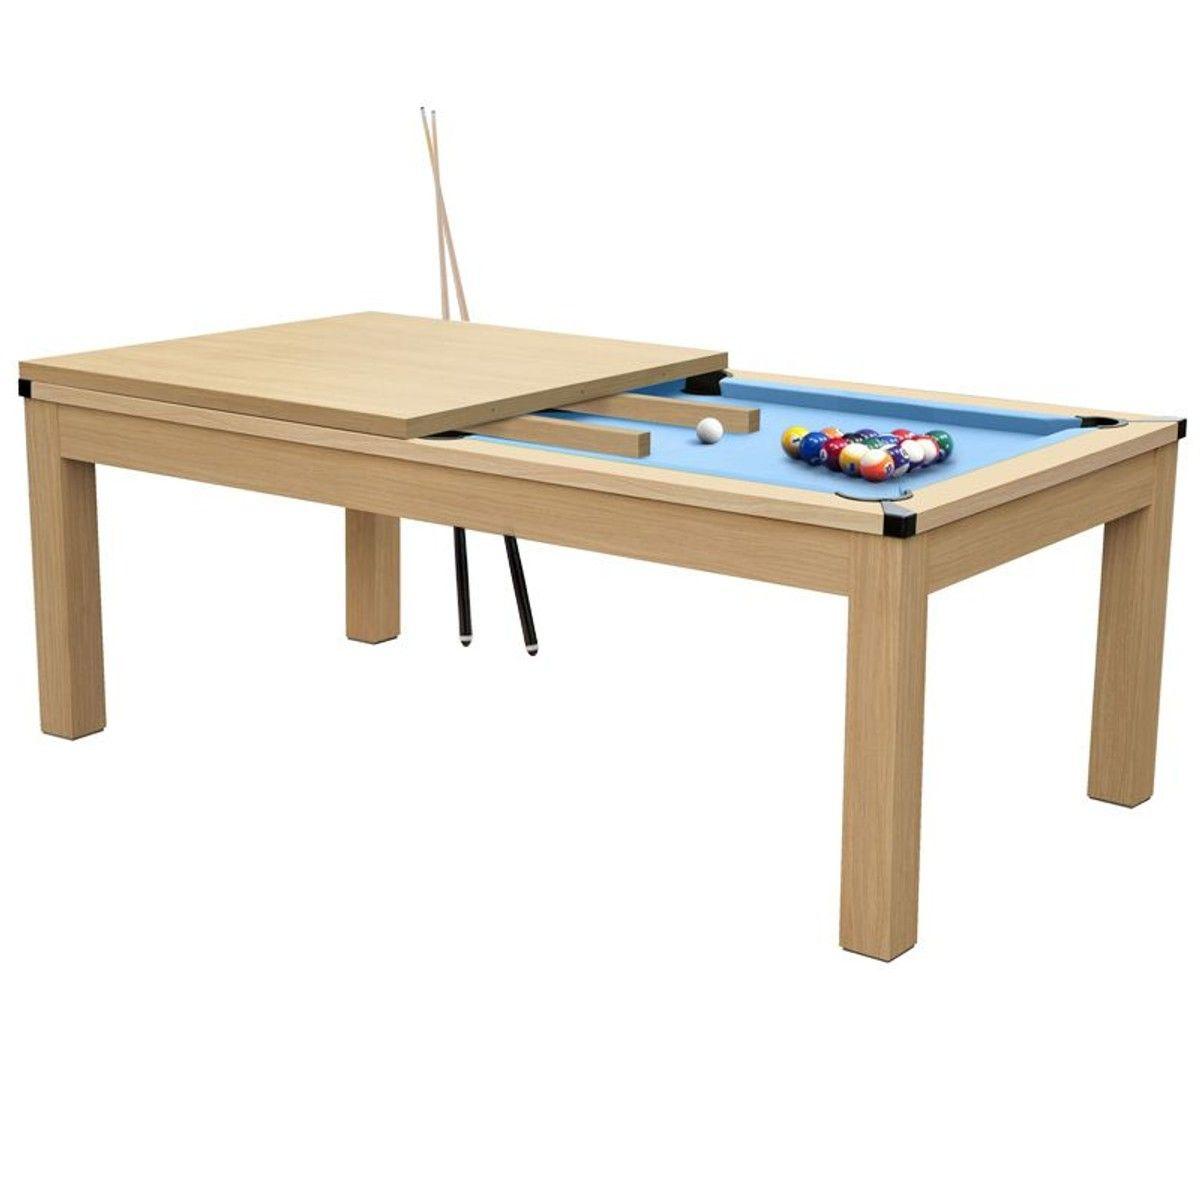 De Hêtre Table Convertible Bleu Billard Tapis Taille8 roeQdBxWC